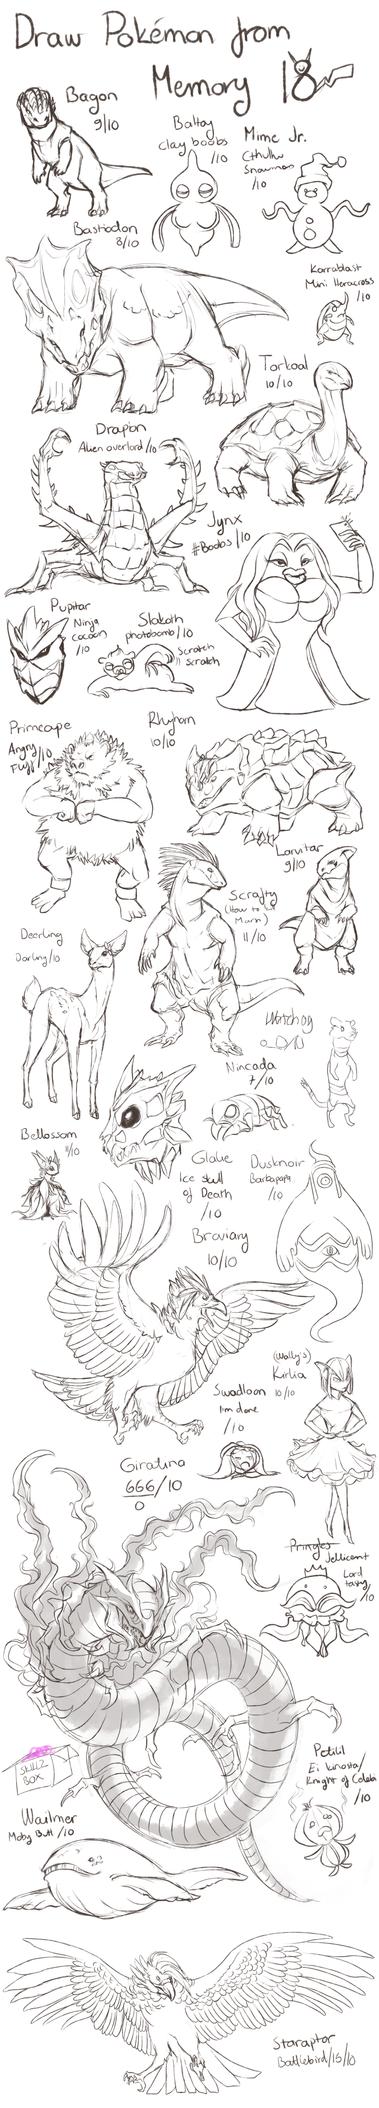 Draw Pokemon from Memory 18 by ShadeofShinon